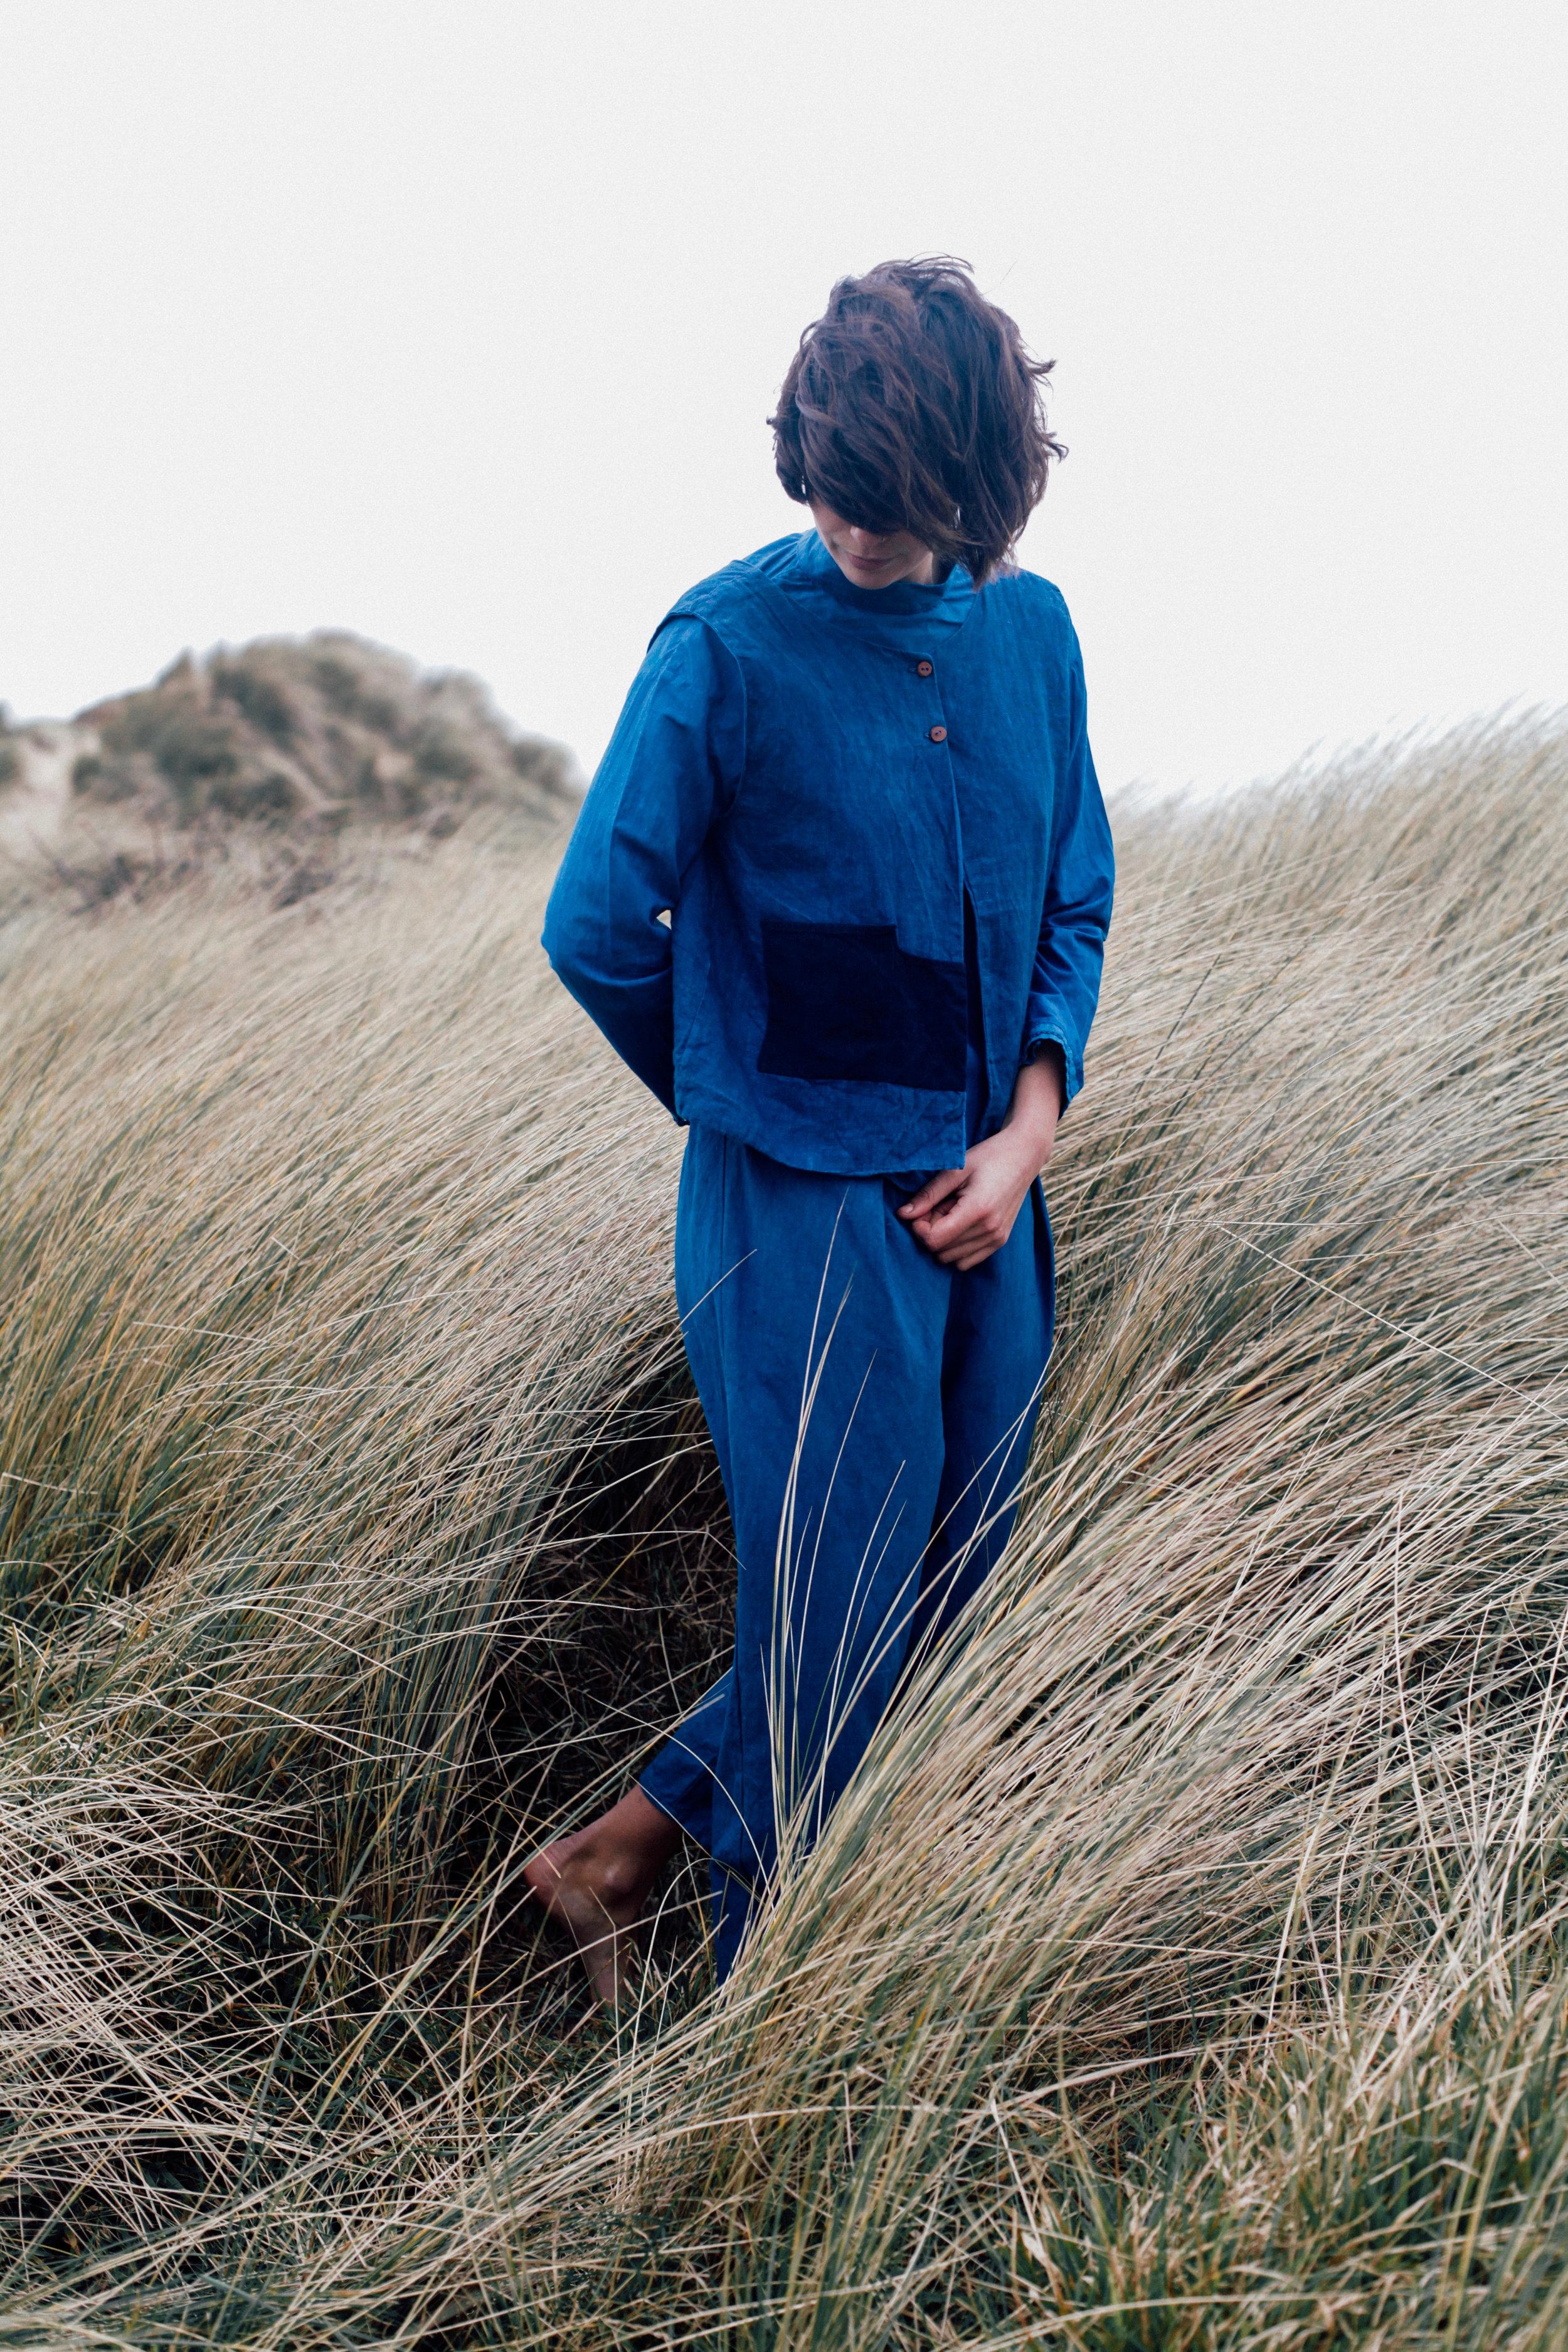 sarah johnson cabbage blue indigo clothing cast cornwall folklore 9